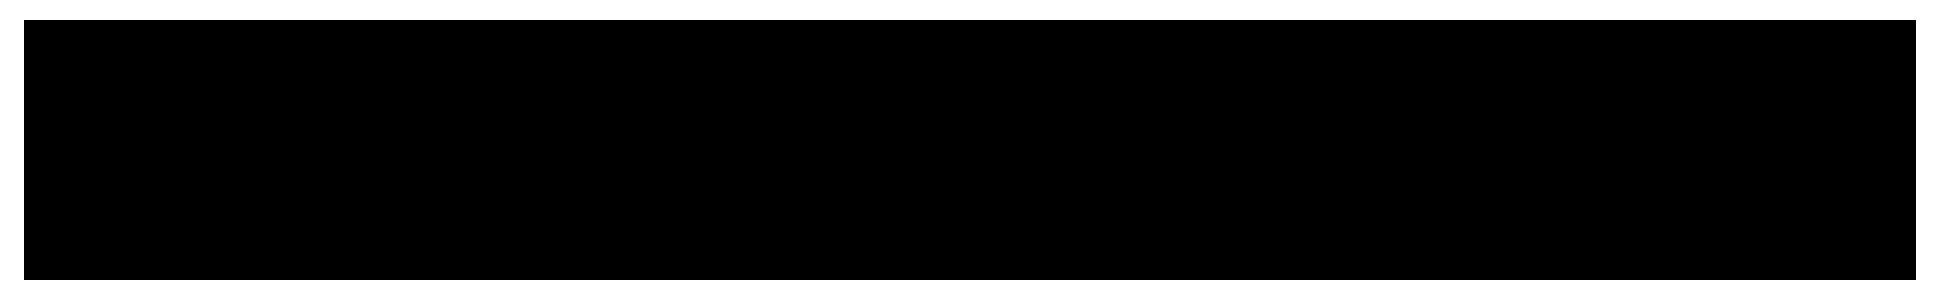 Converse logo black.png - Converse PNG